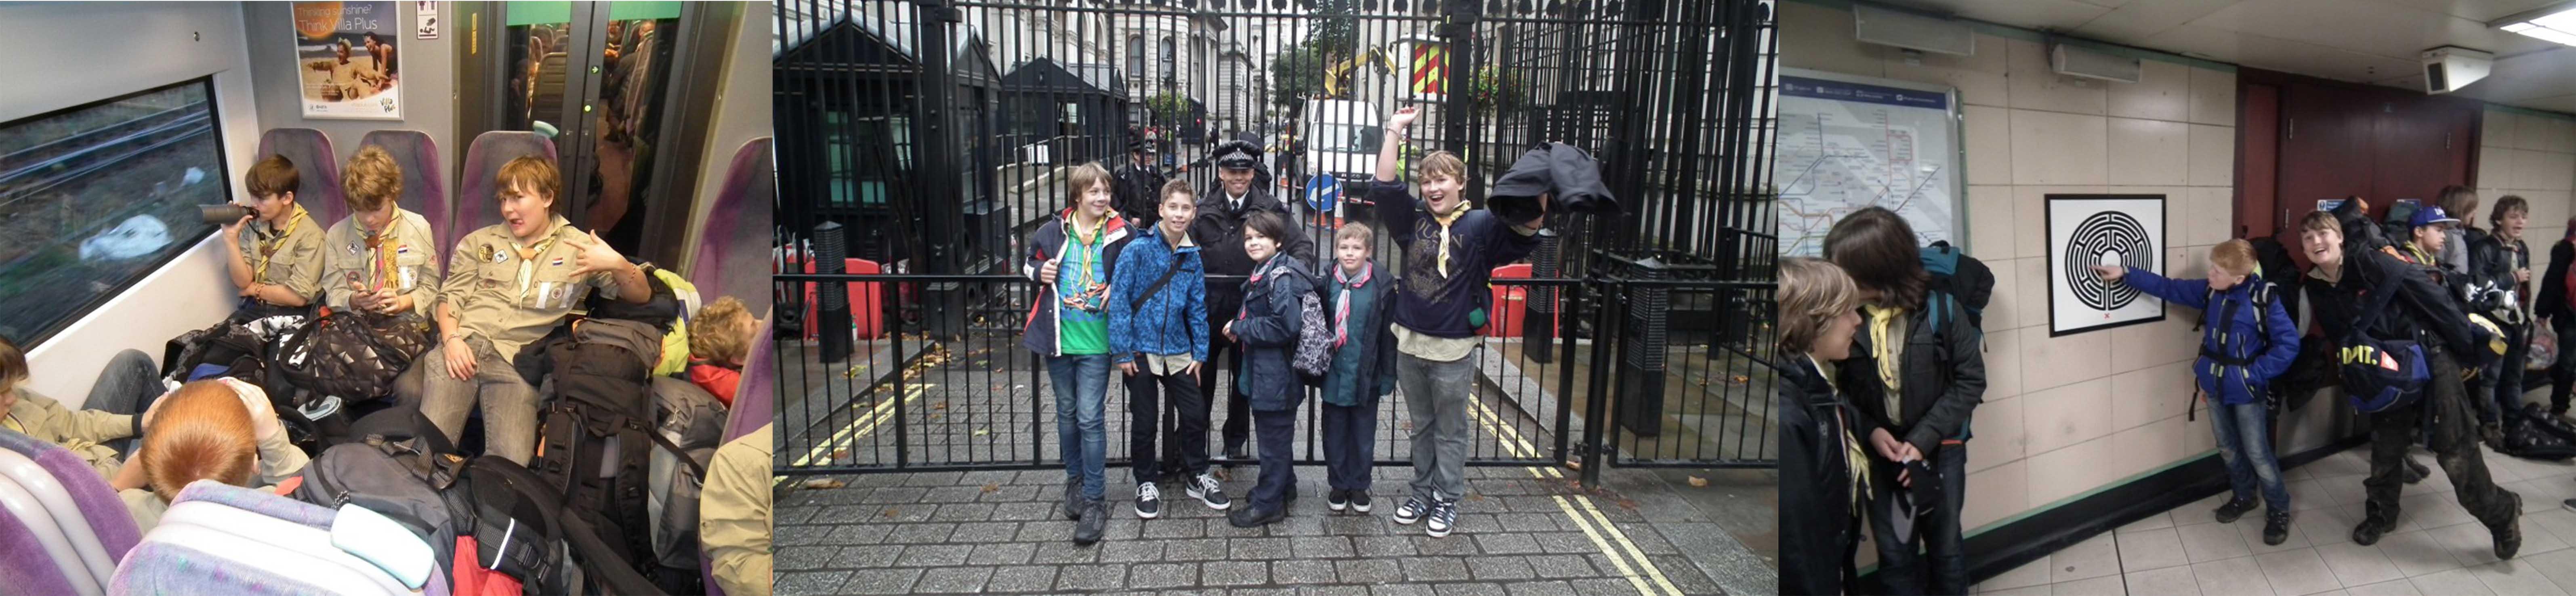 Scoutinggroep Be Pals Prinses Juliana